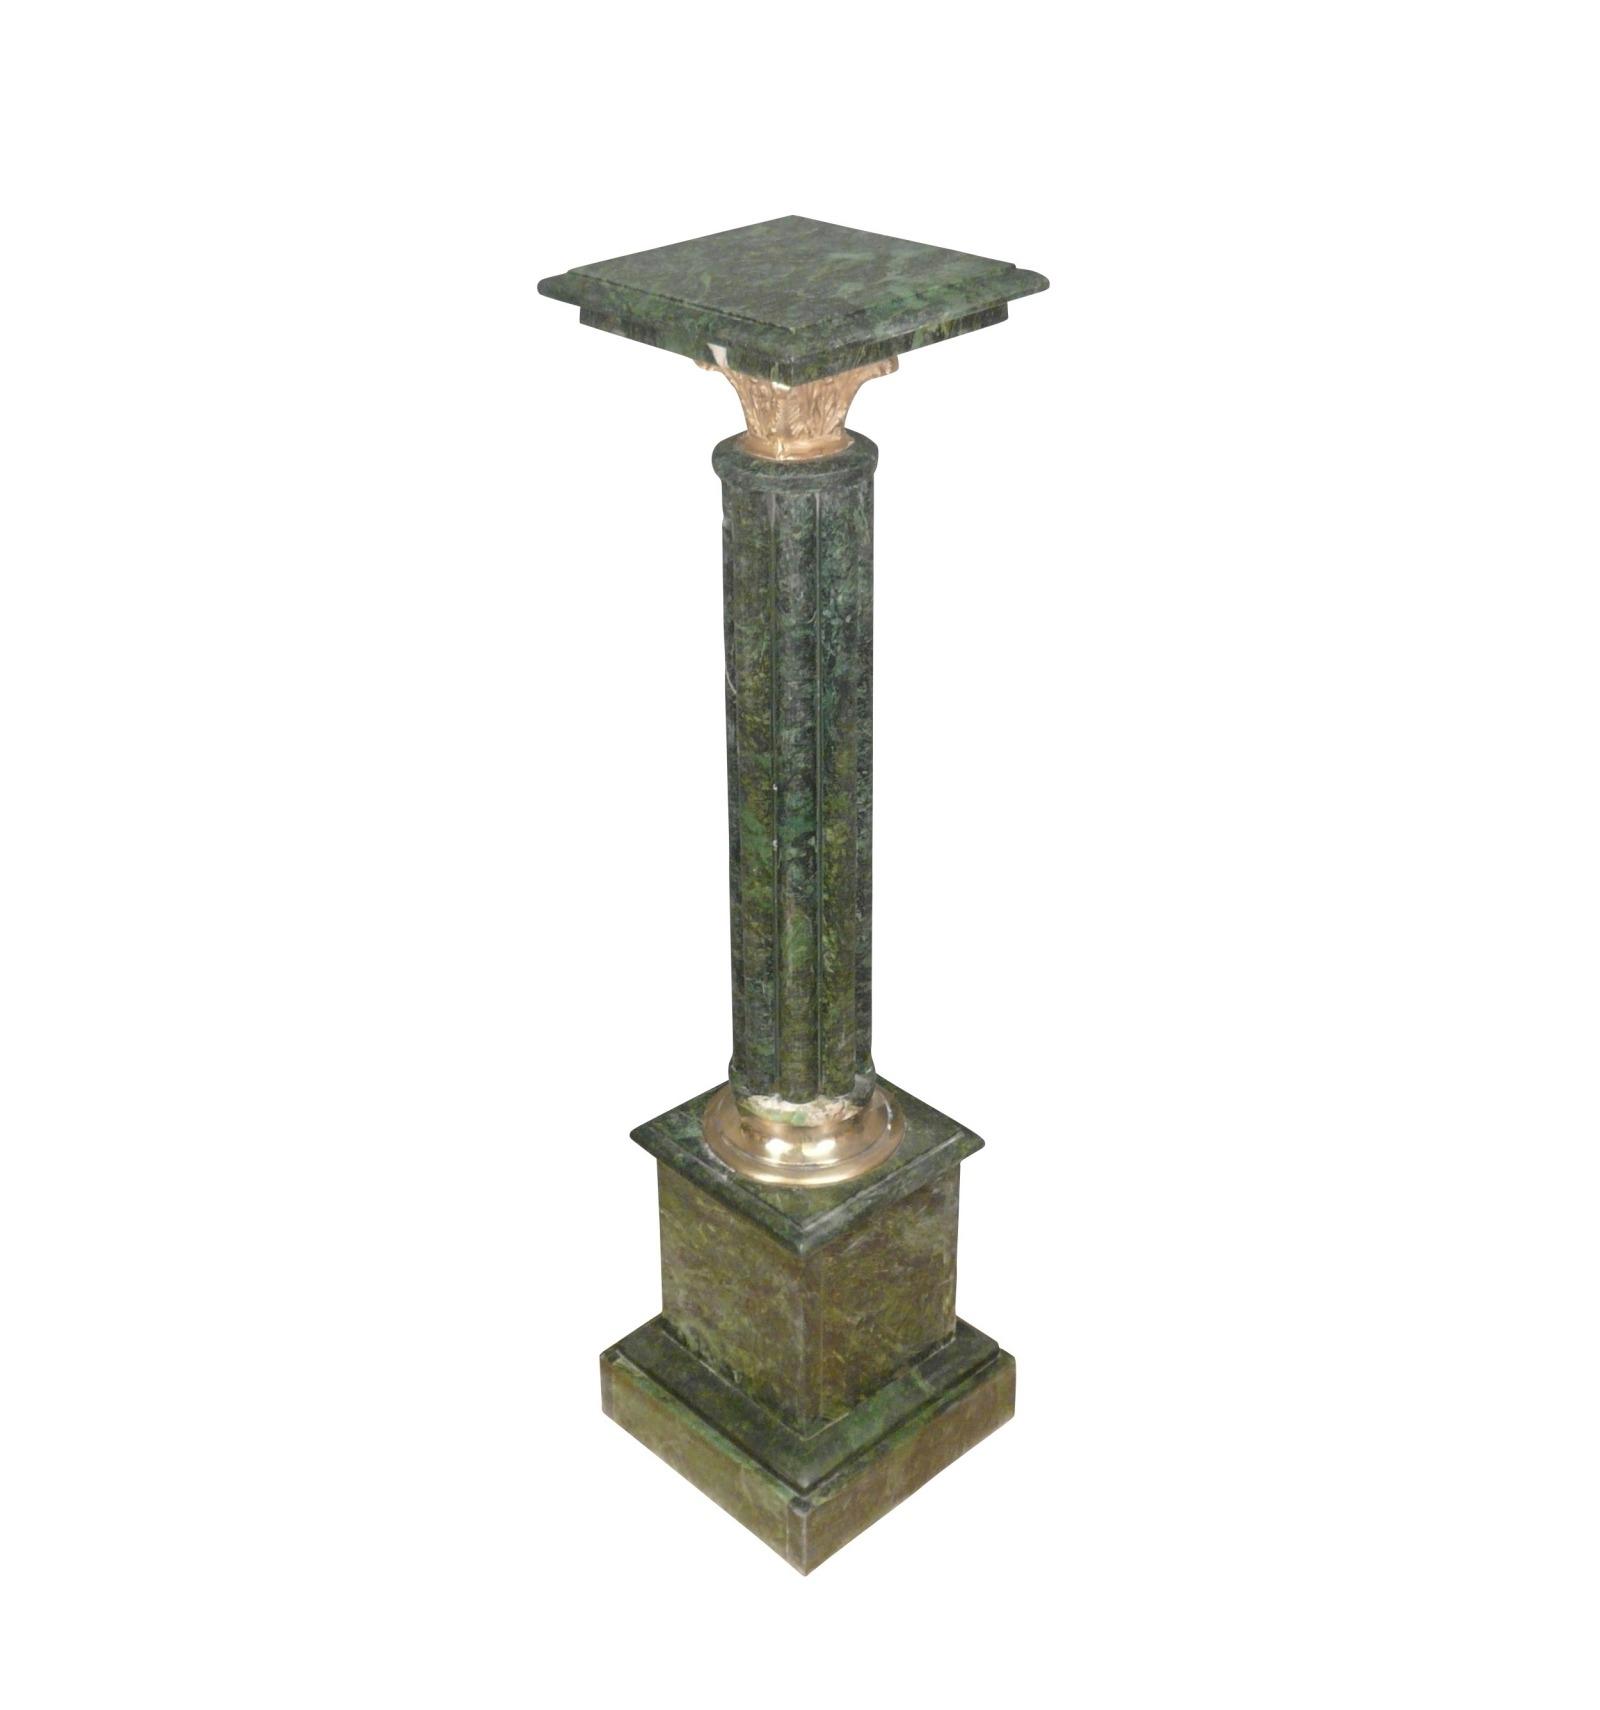 Columna de m rmol verde napole n iii - Columna de marmol ...